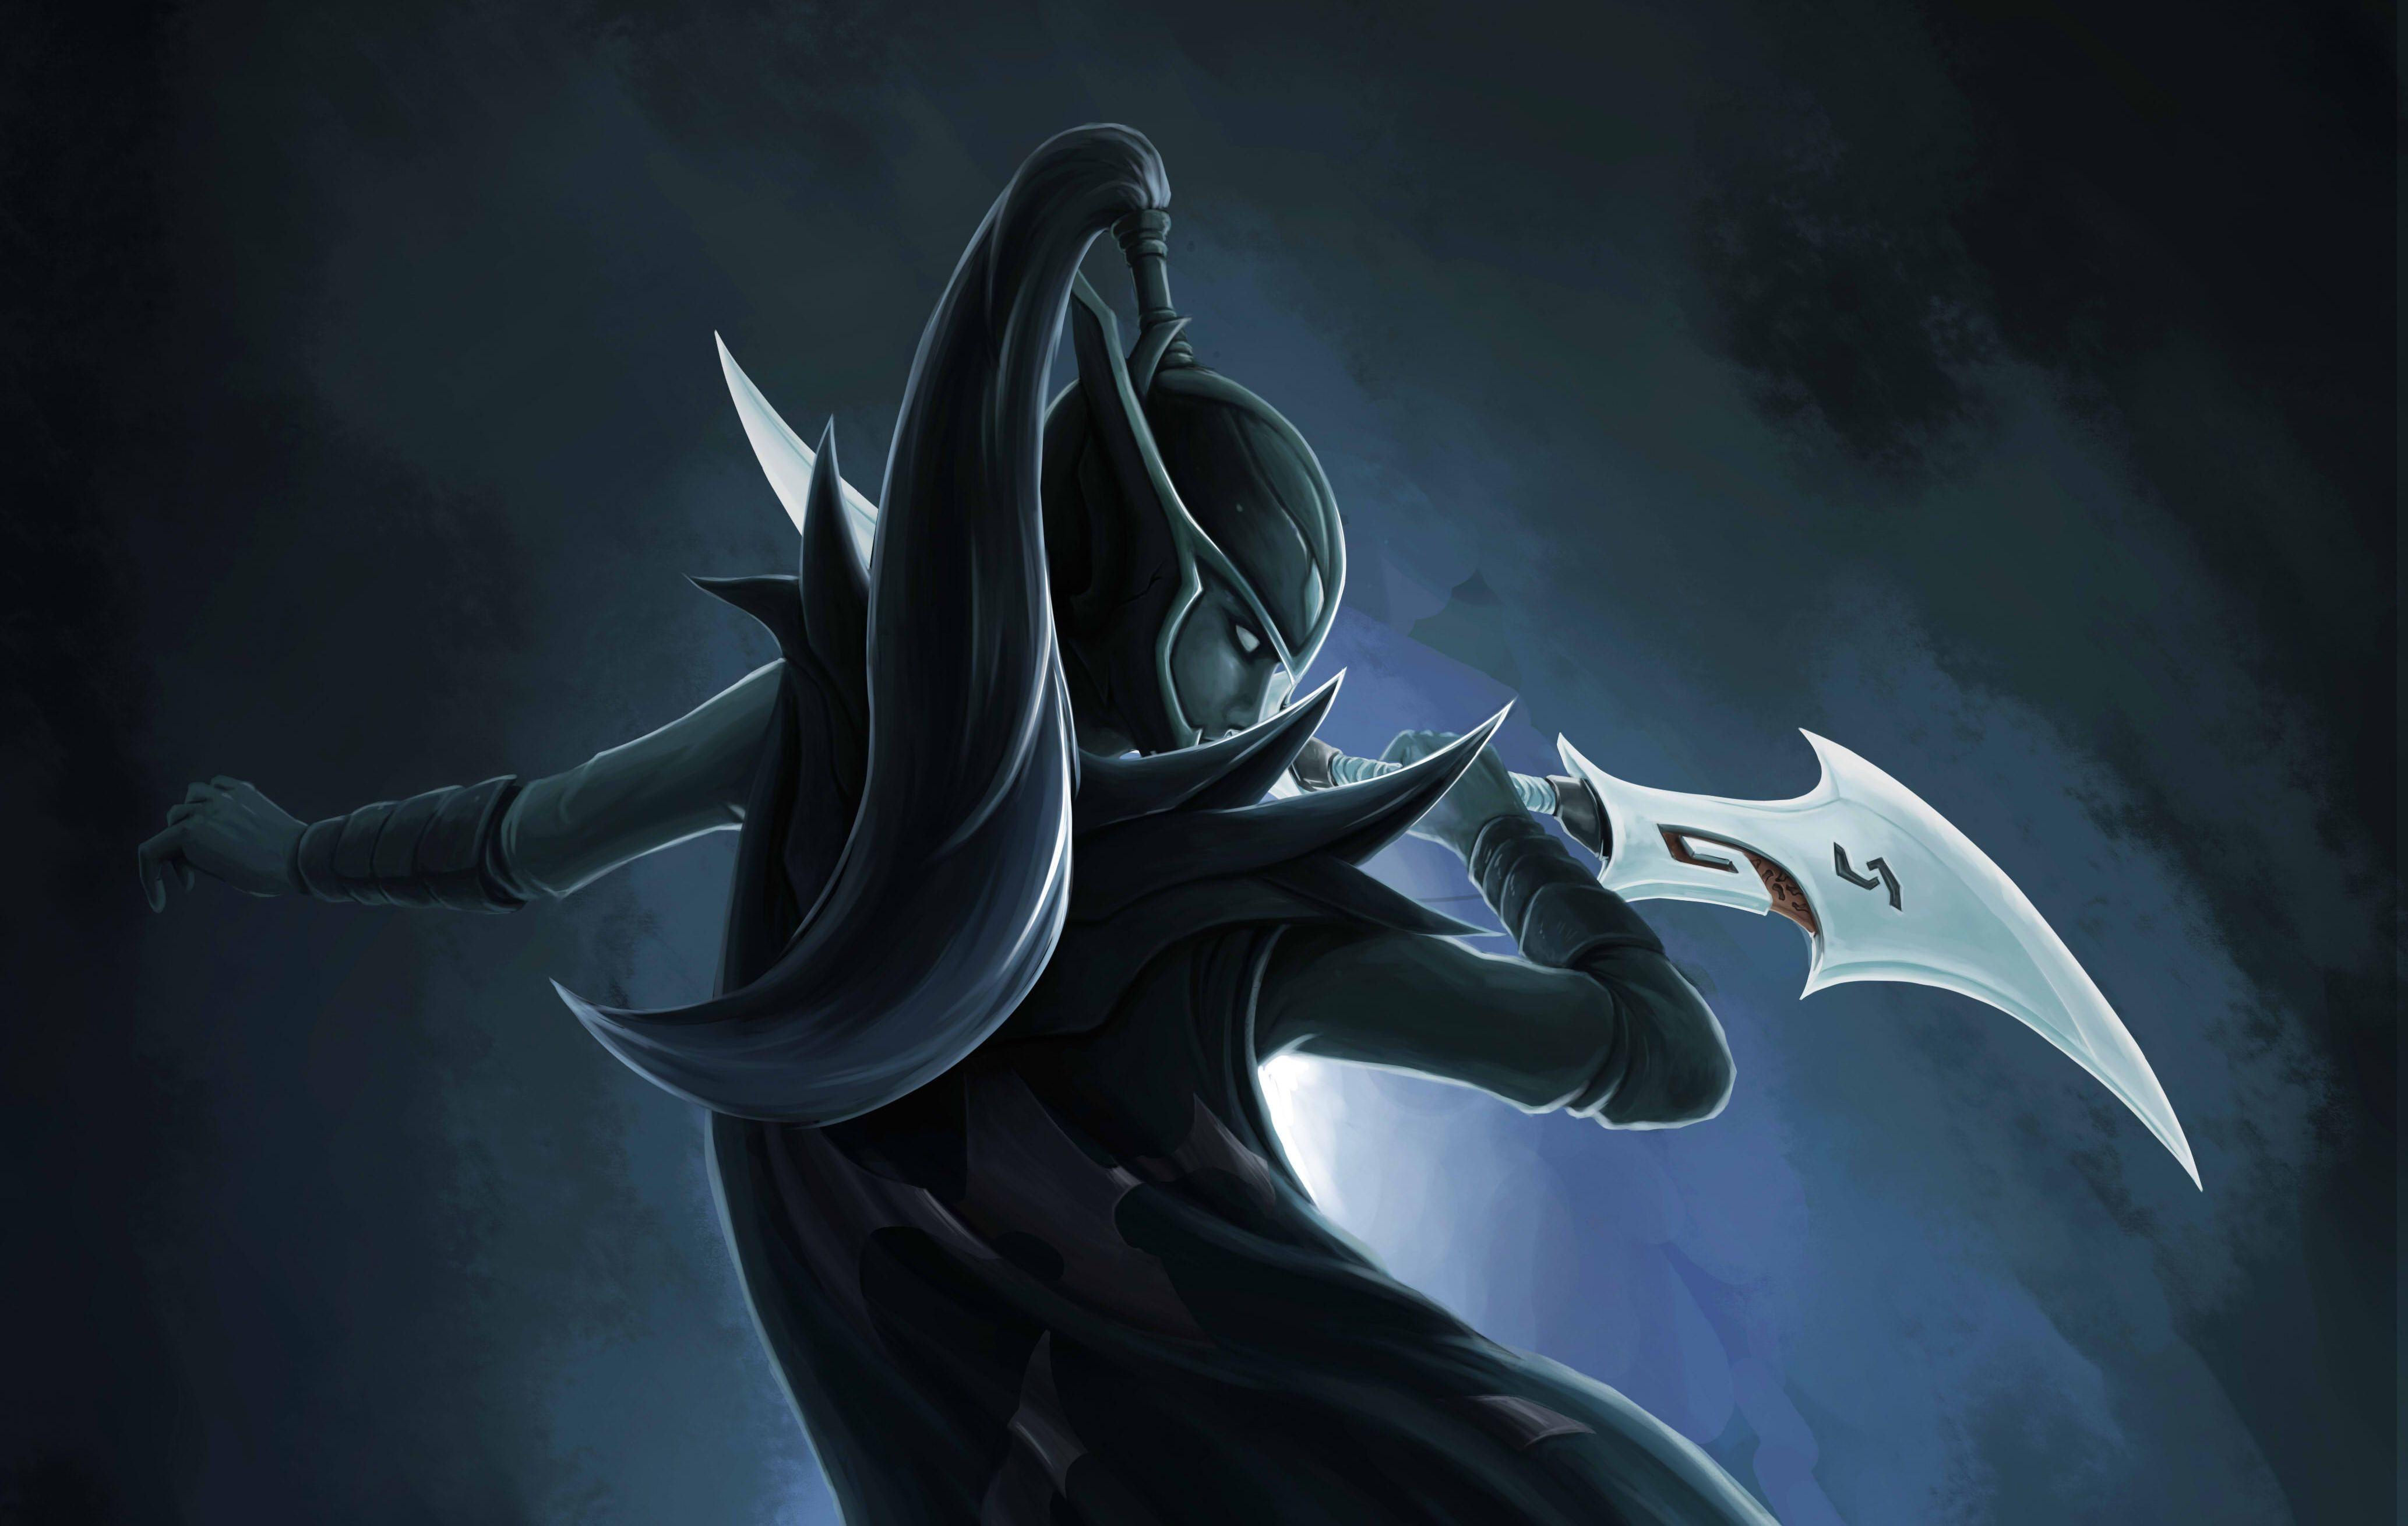 Download Wallpaper Girl Weapons Art Blade Dota 2 Phantom